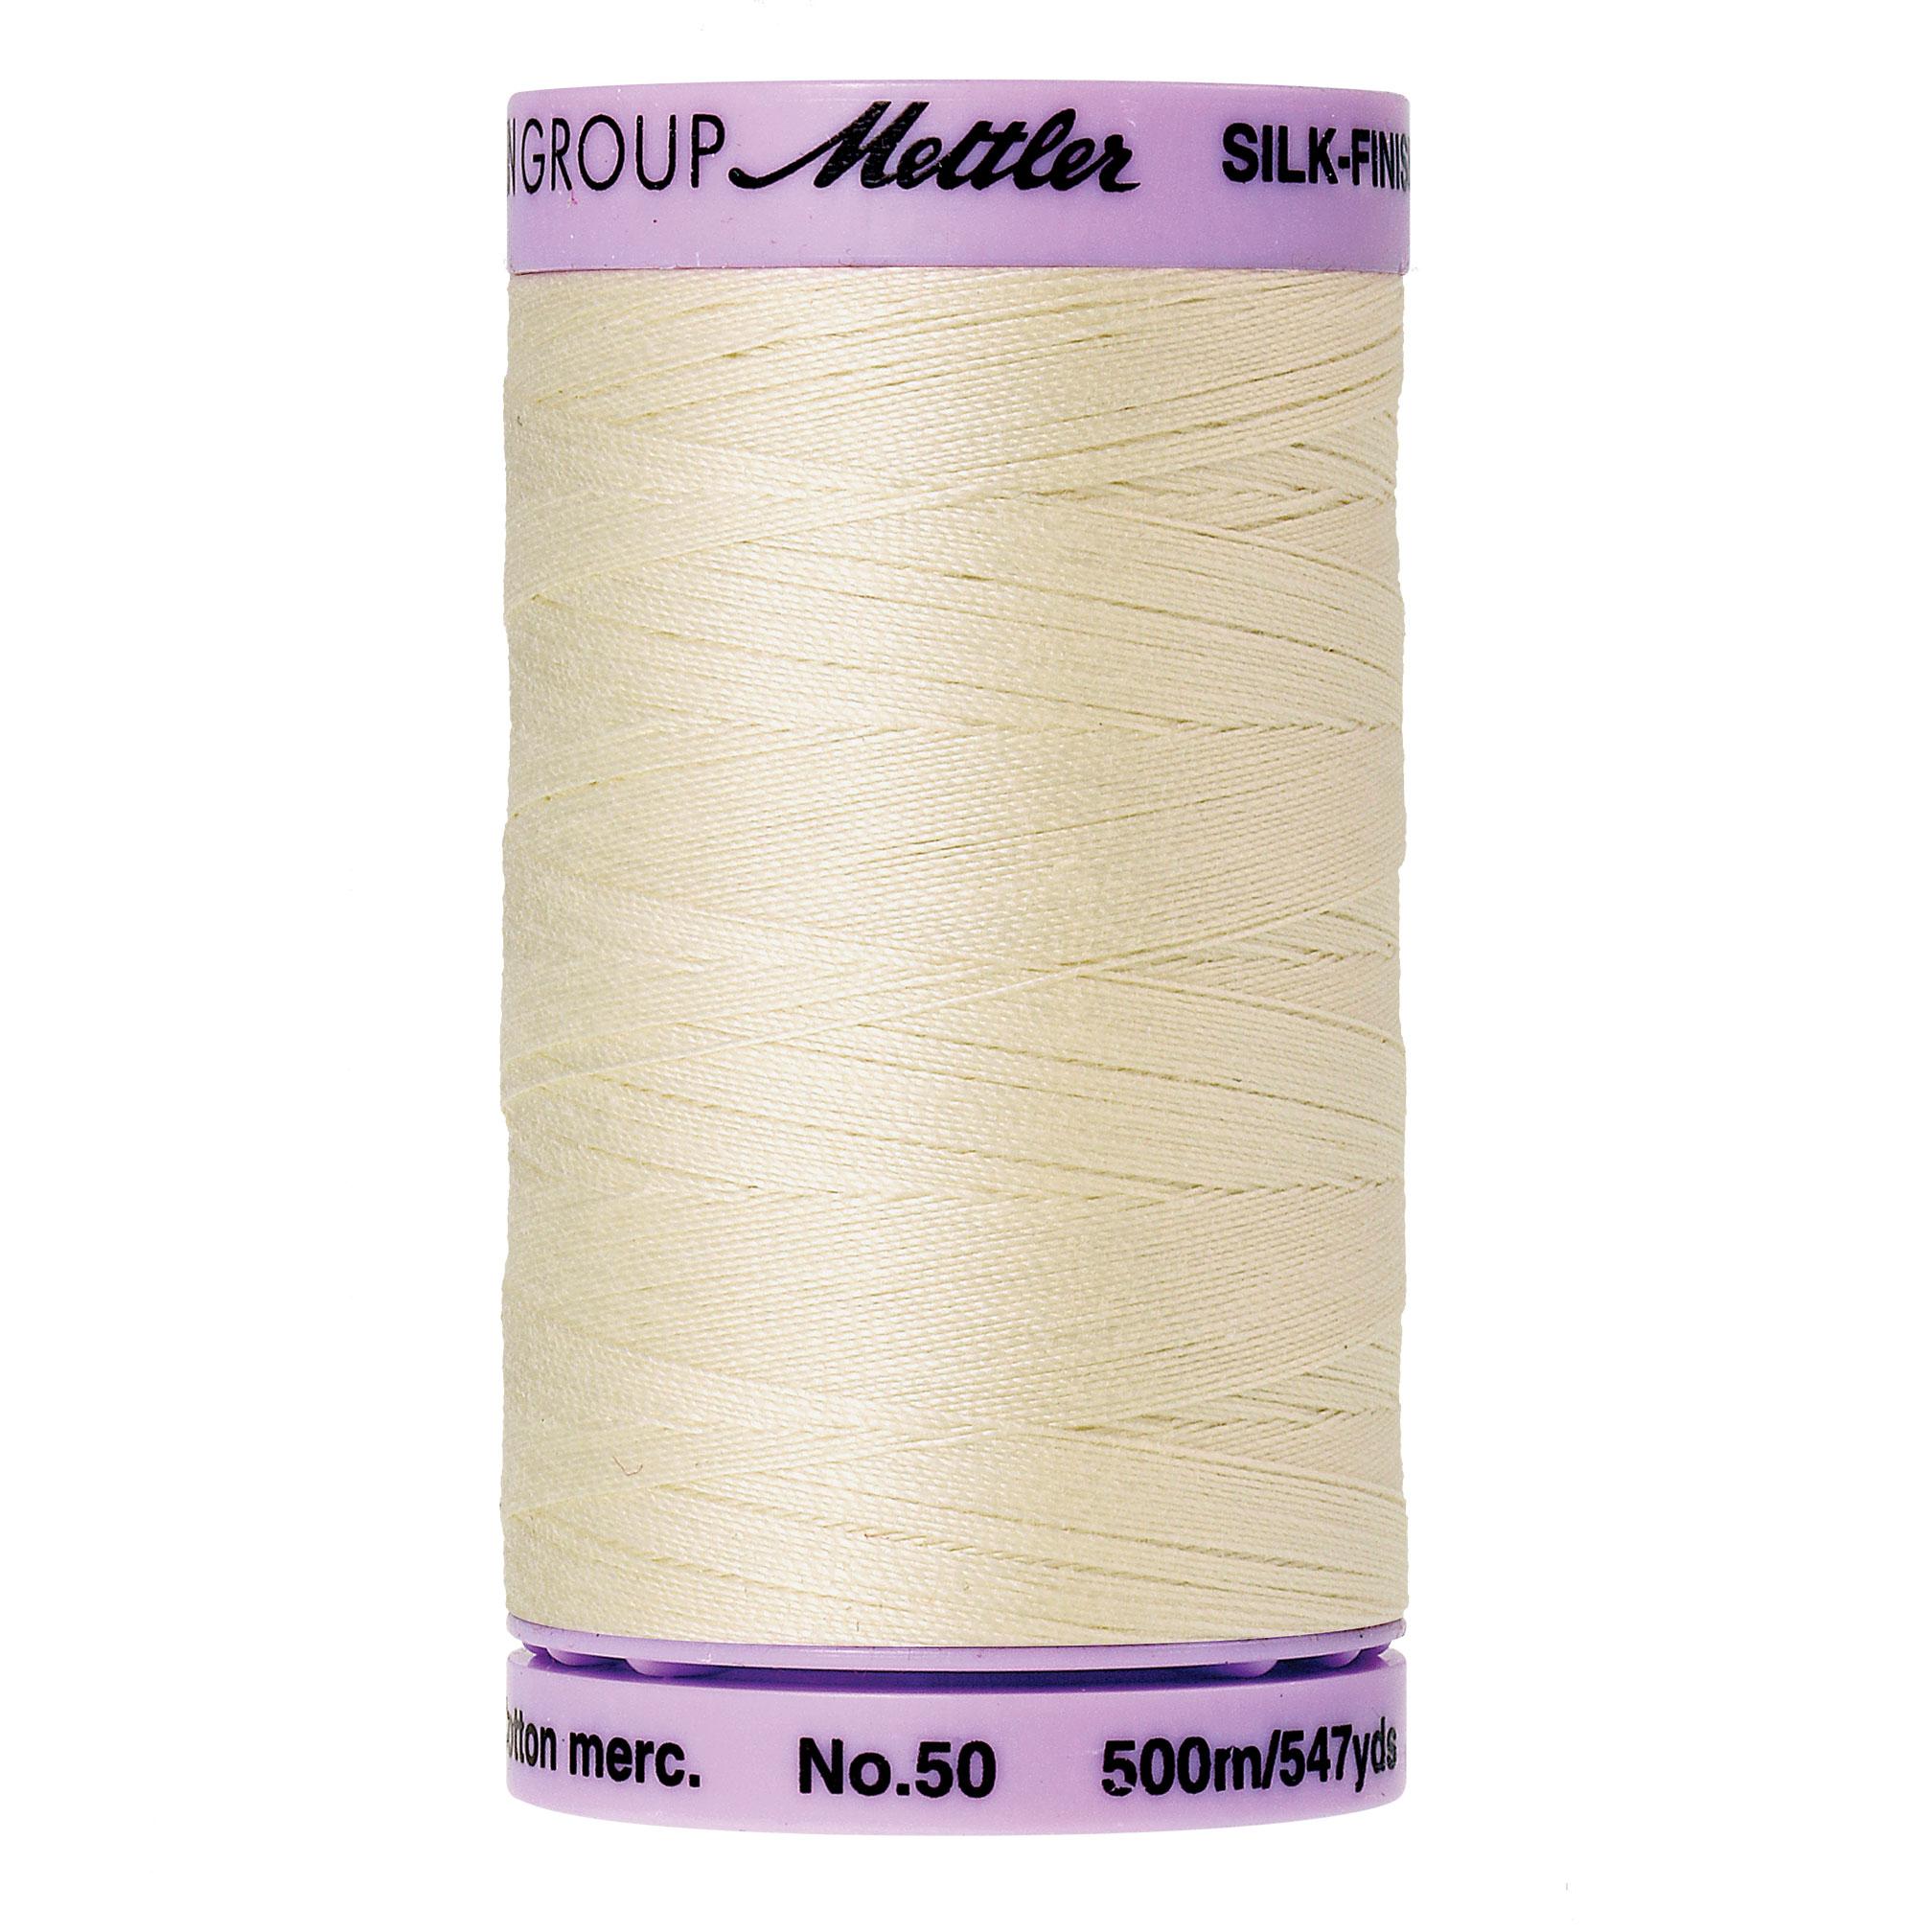 Mettler Silk-Finish 50wt Cotton Thread 547yd.  9104-3612